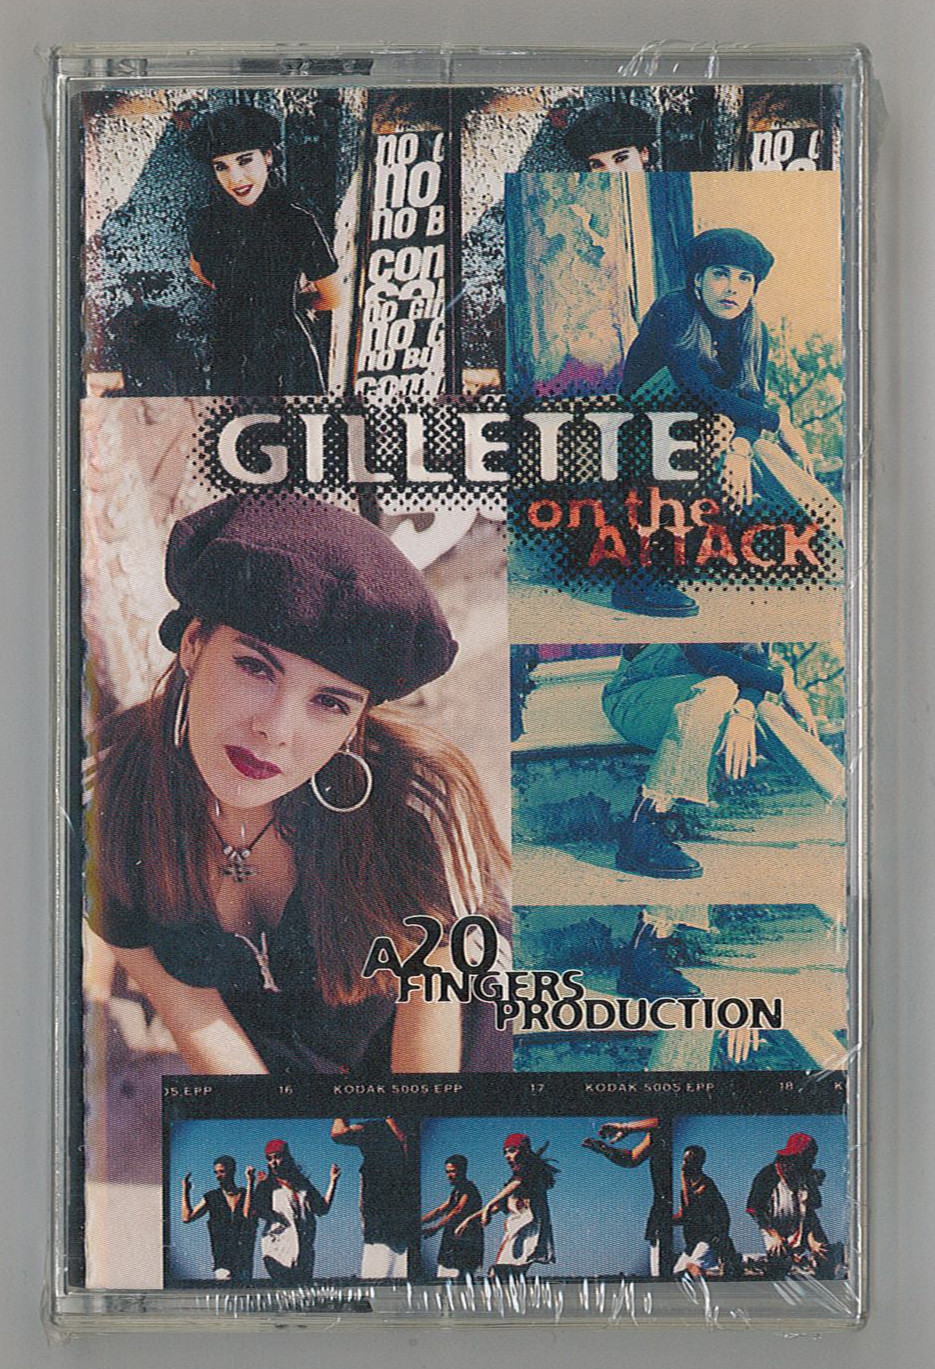 WLWLTDOO-1994-CS-GILLETTE-ATTACK-FRONT.jpg